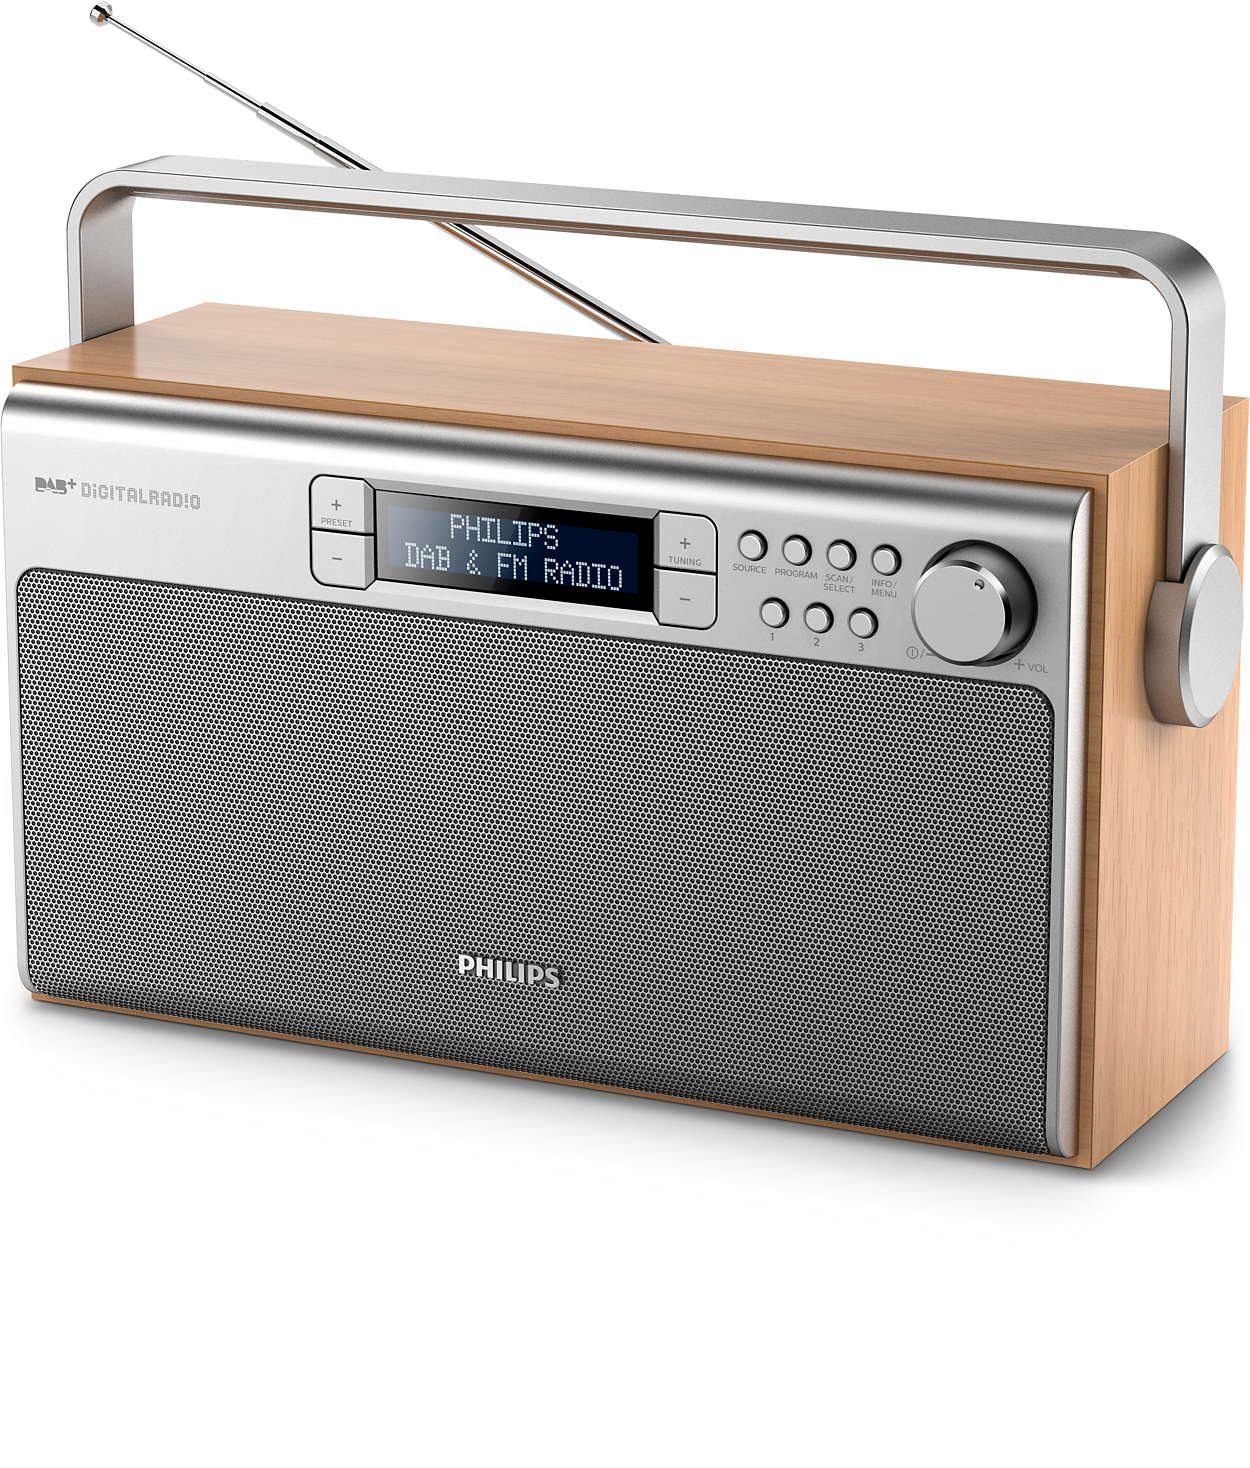 portable radio ae5220 05 philips